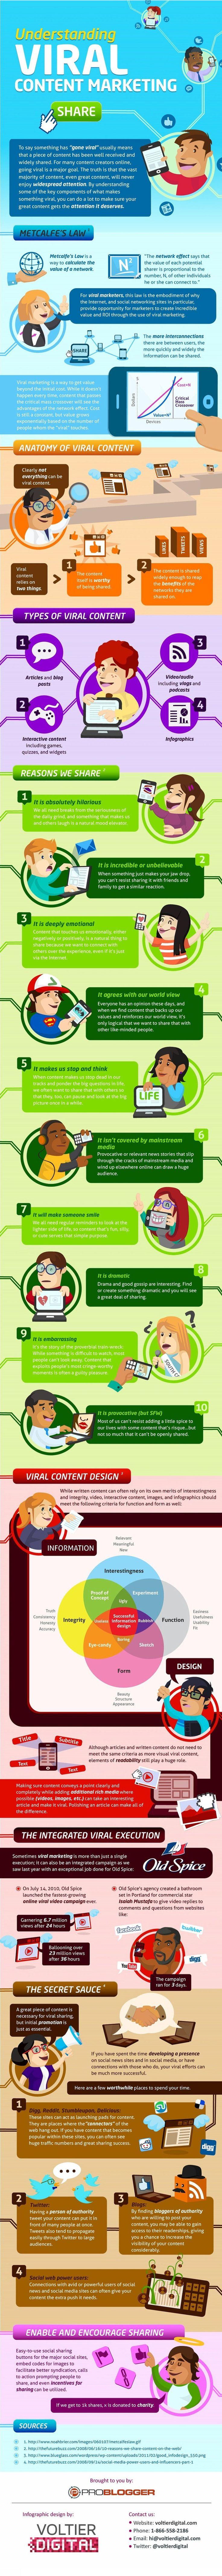 Understanding viral content marketing #infographic #contentmarketing